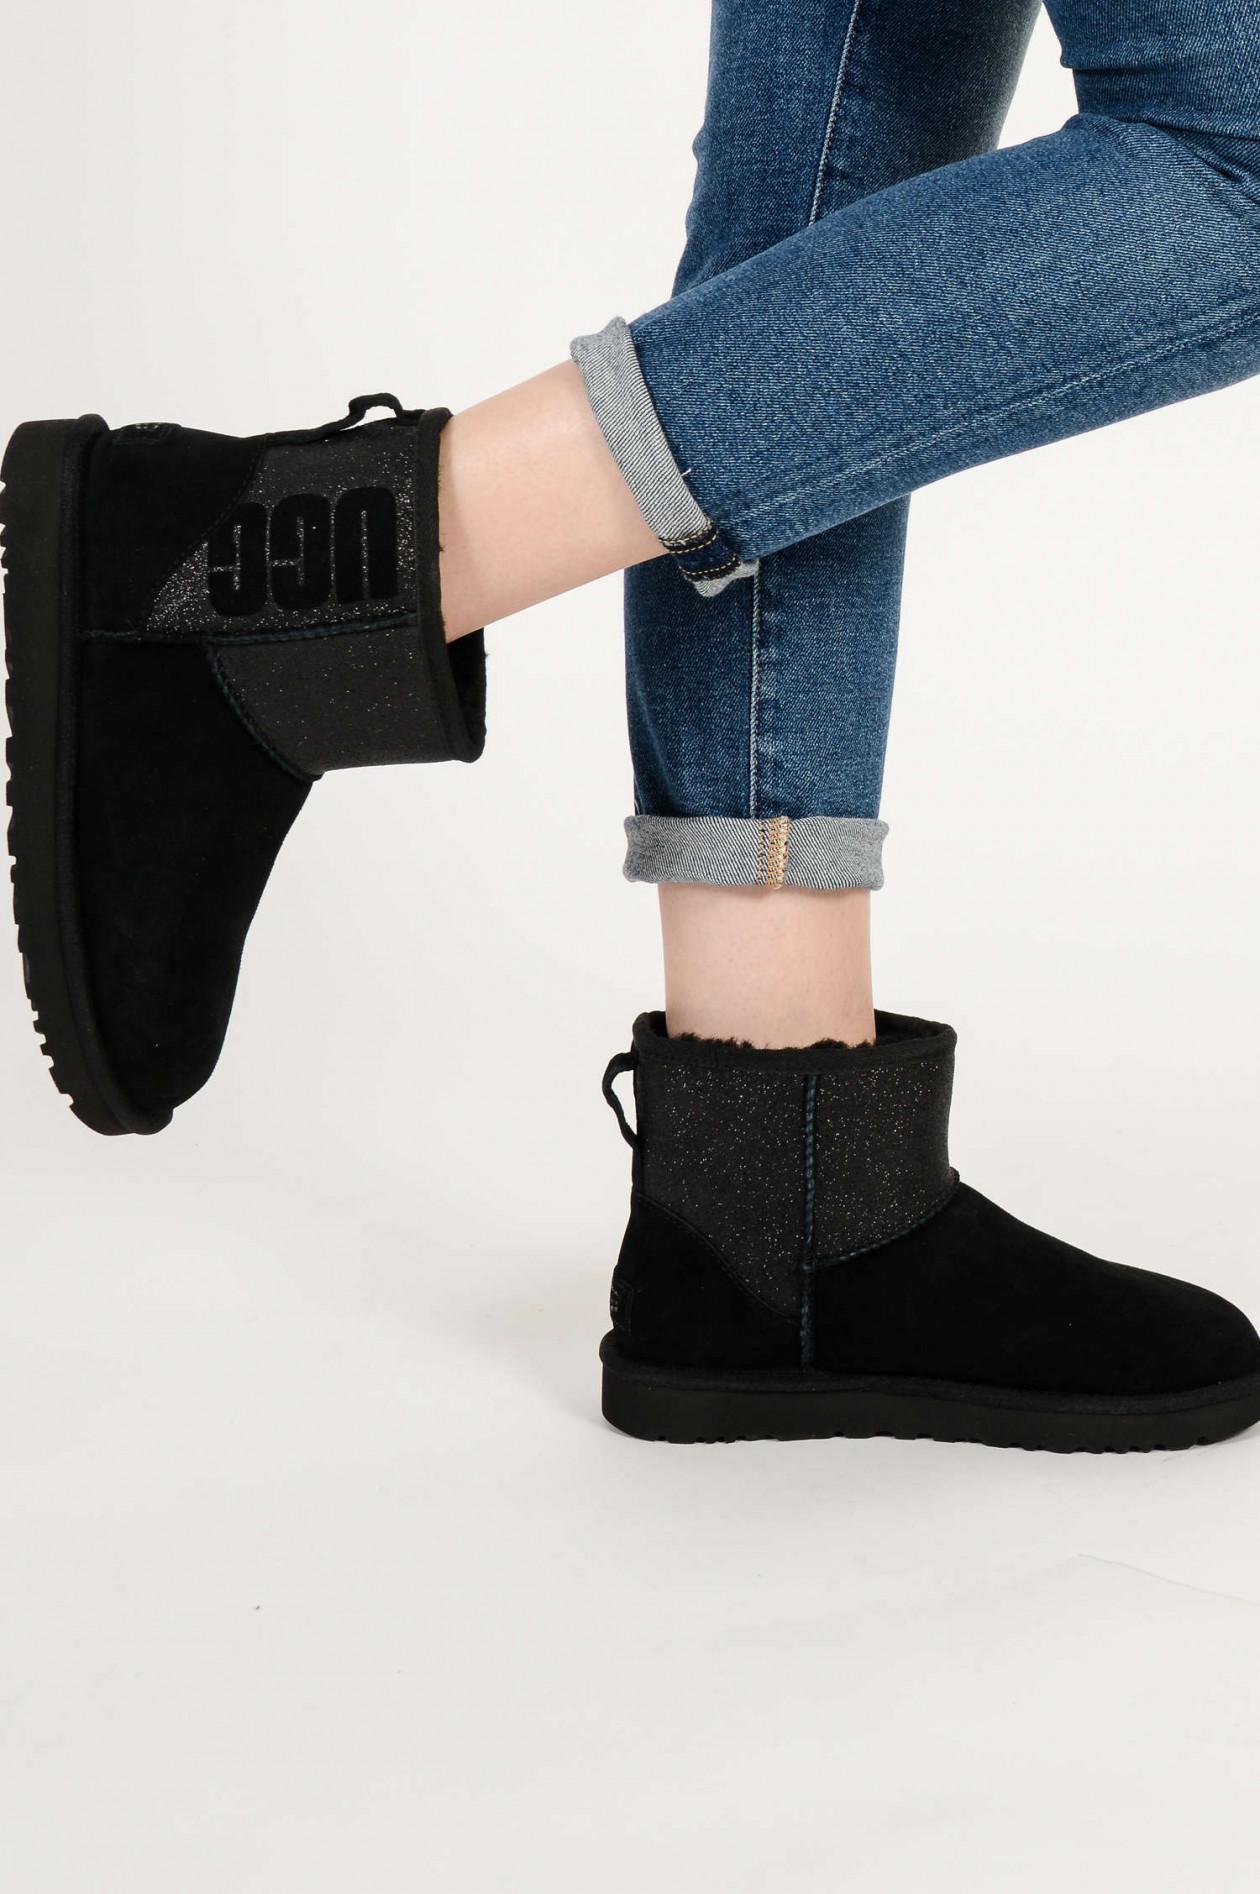 Boots CLASSIC MINI LOGO SPARKLE in Schwarz